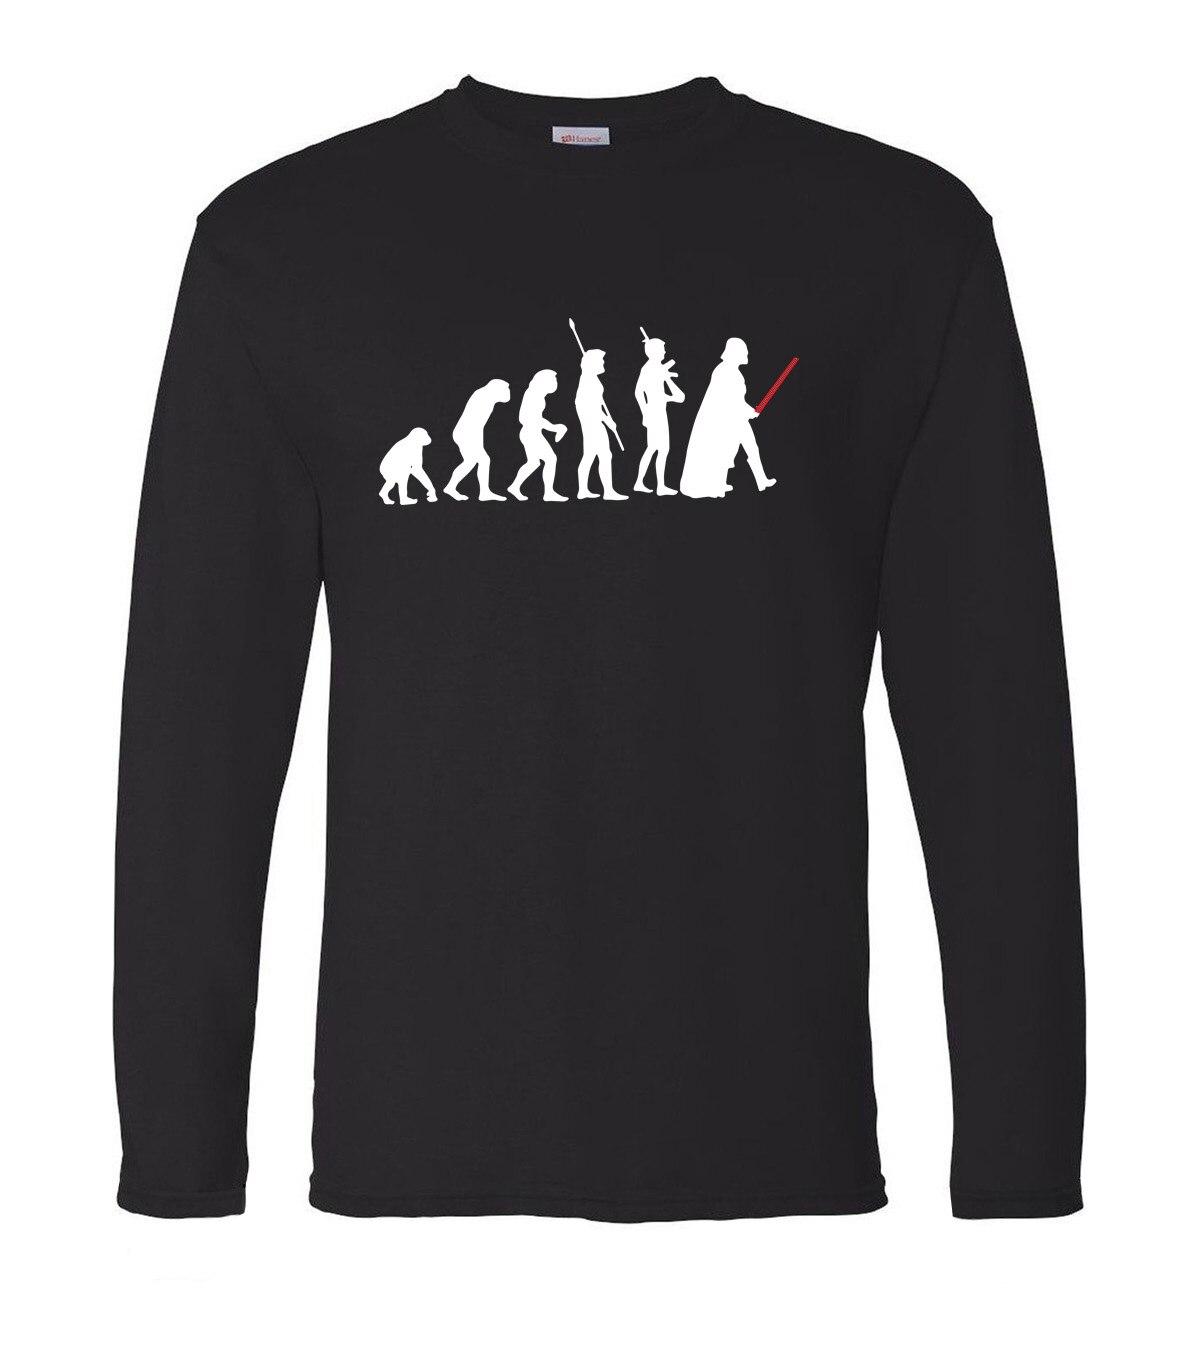 Star wars Darth Vader Evolution hip hop men long sleeve T-shirts fashion men t shirt 2019 spring 100% cotton slim men top tees